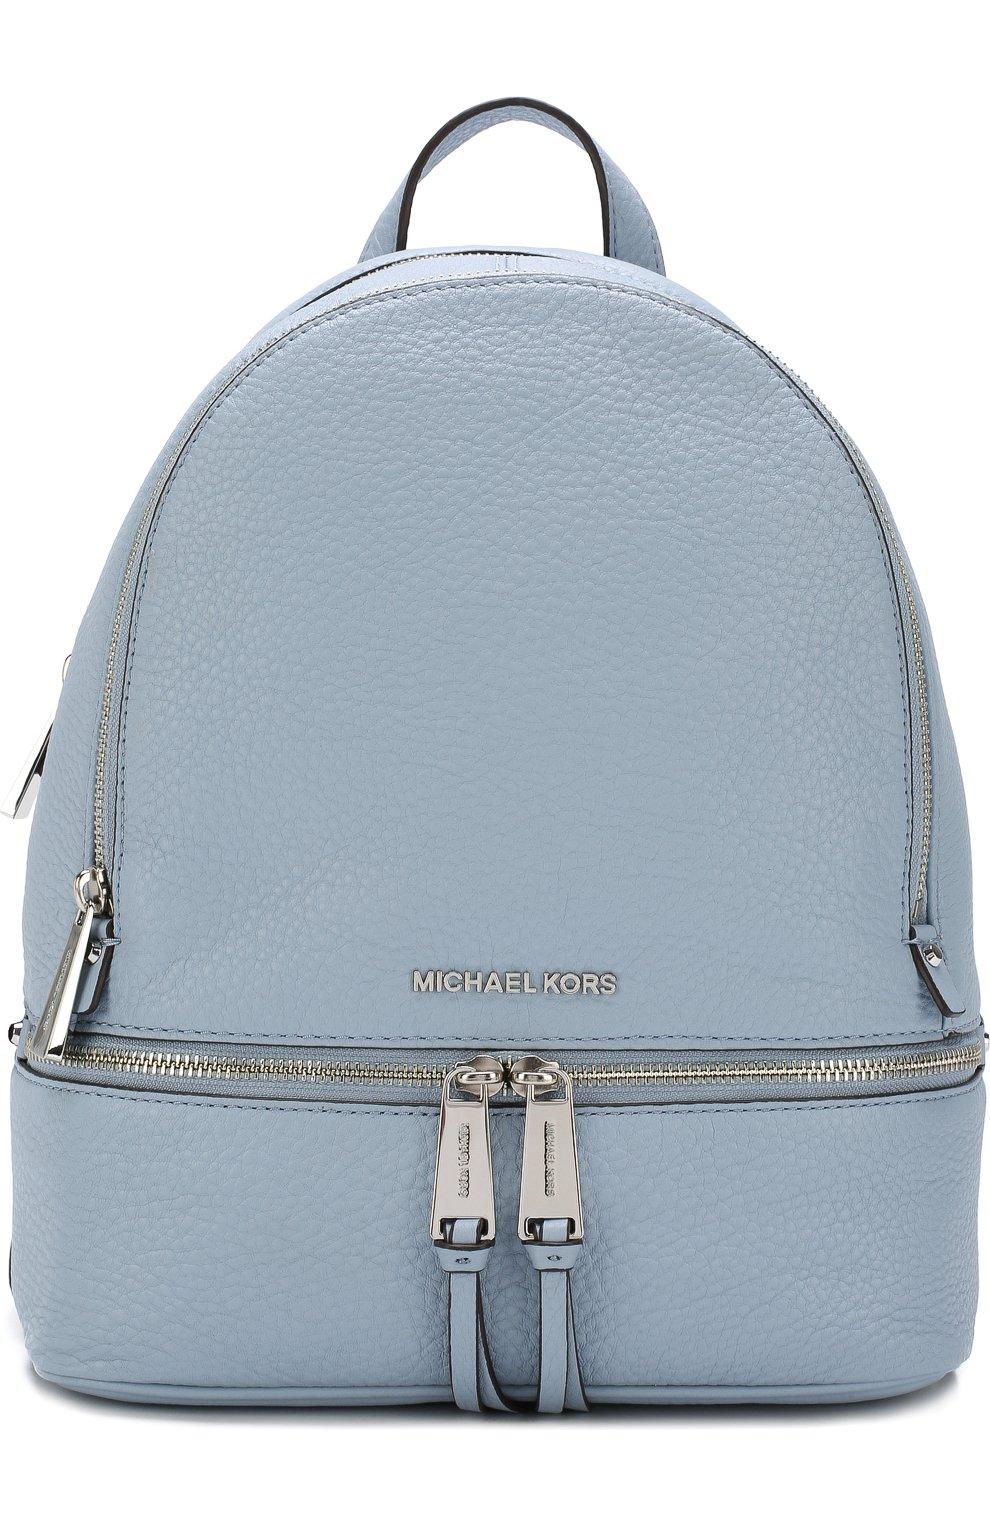 Кожаный рюкзак Rhea Zip Small | Фото №1